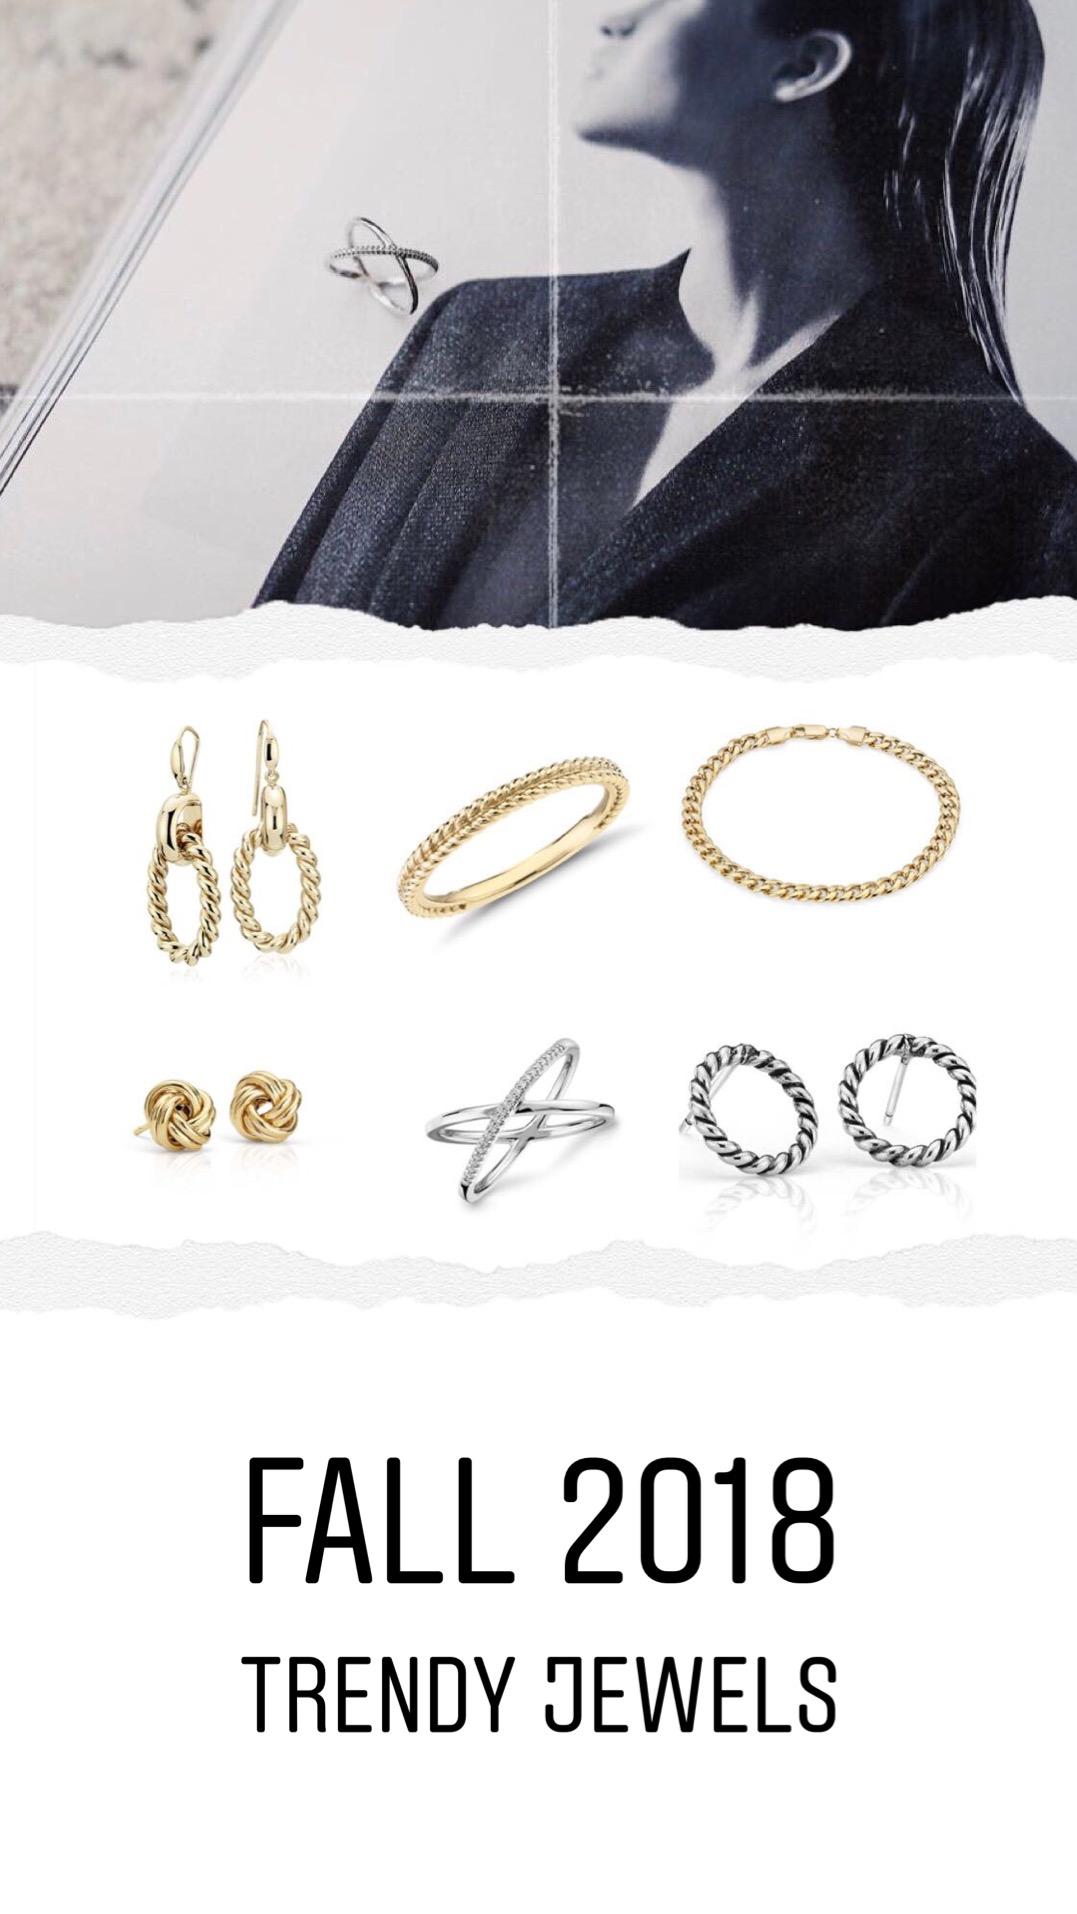 fall 2018 trendy jewels: minimal ring and rope jewels dad jewels blue nile diamond